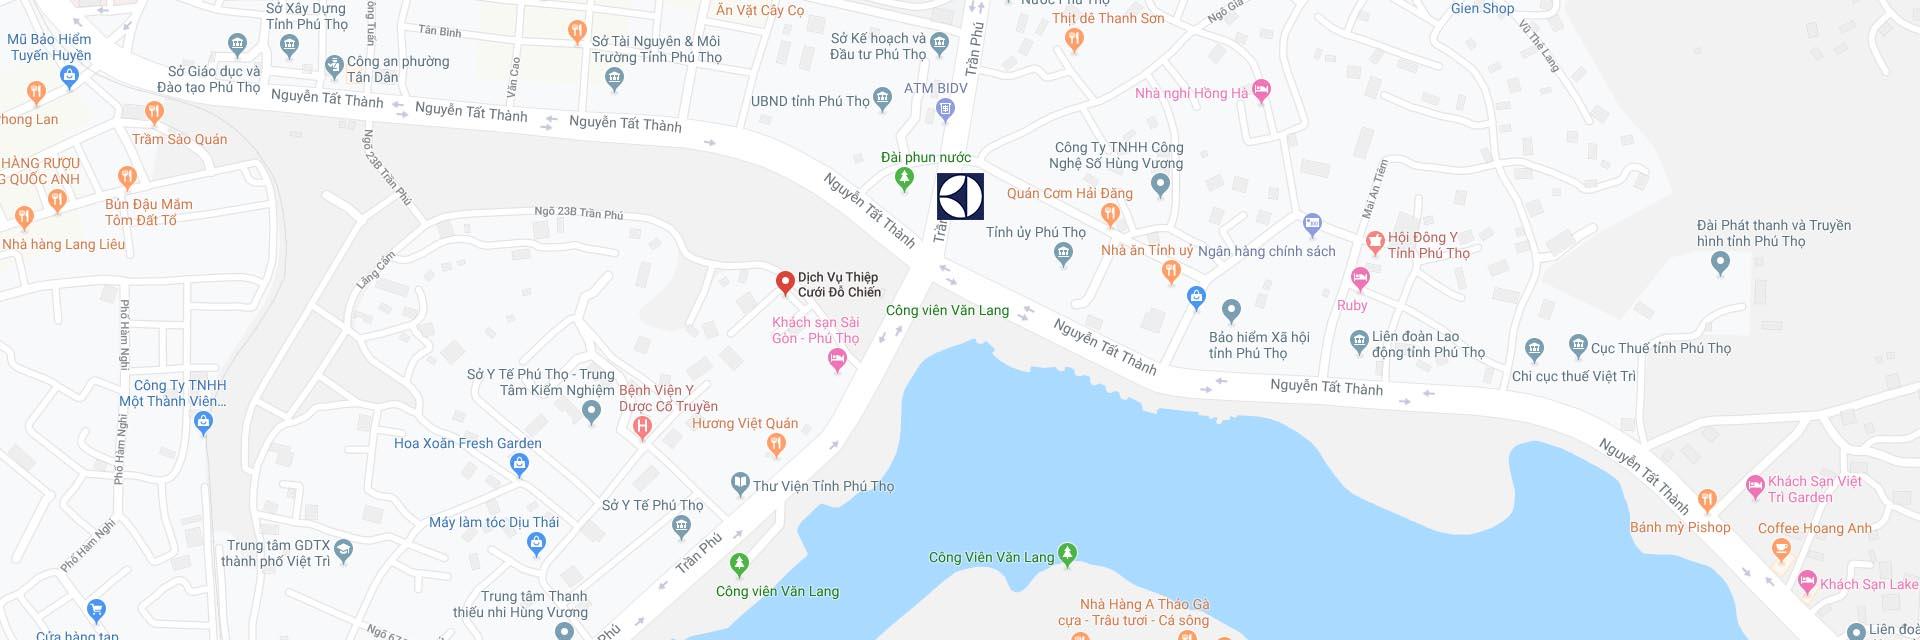 Google Maps Trung tâm sửa máy giặt Electrolux tại Phú Thọ